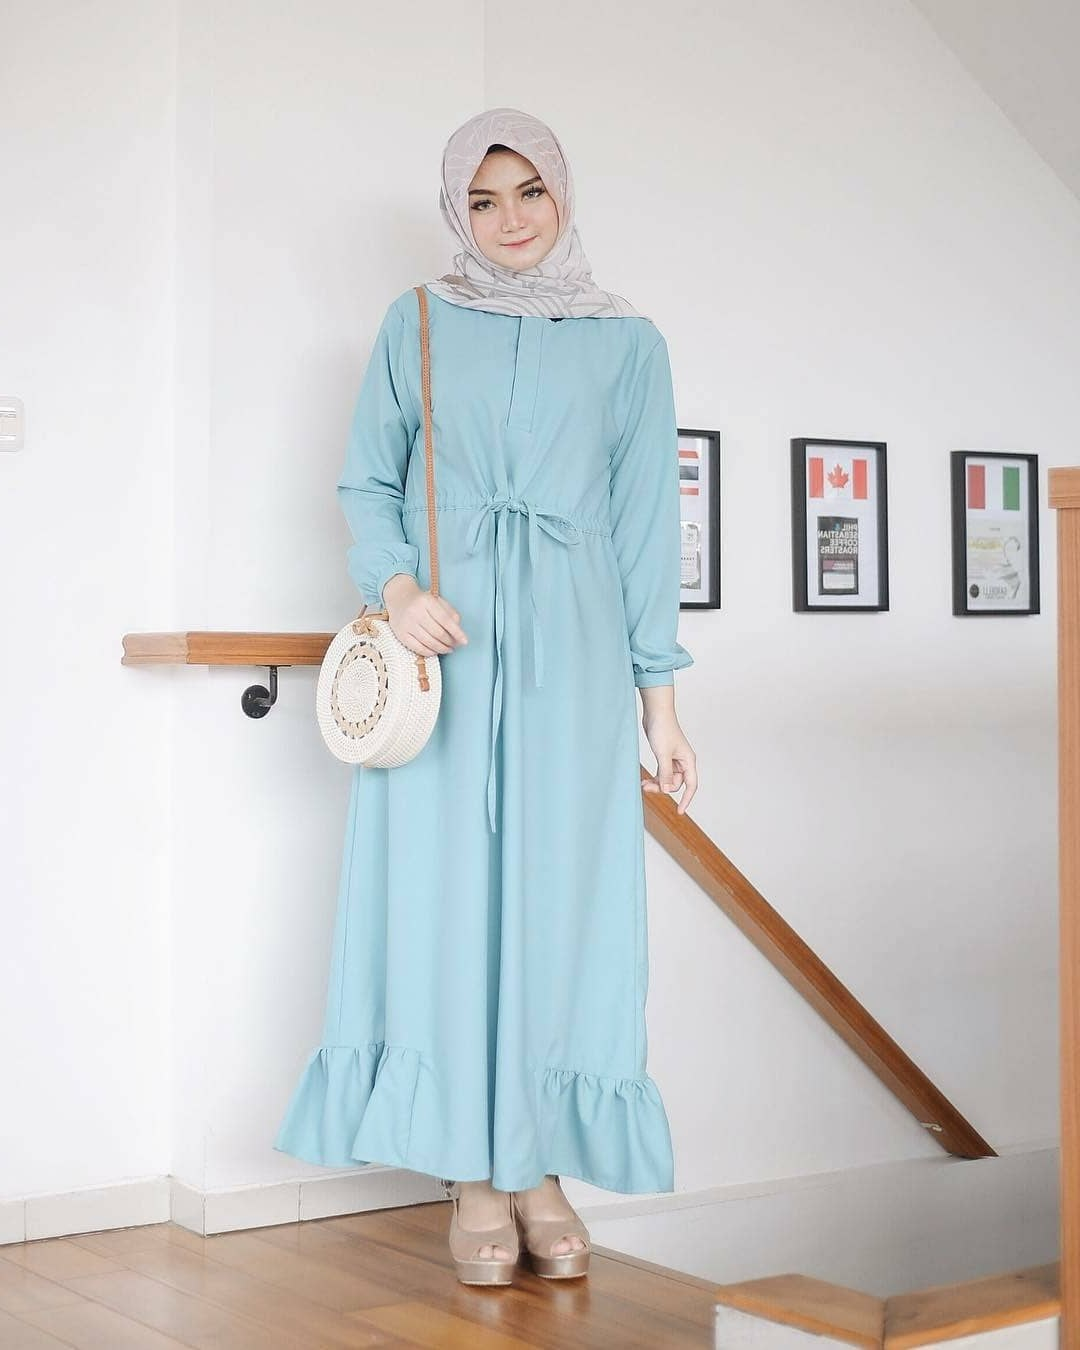 Ide Fashion Baju Lebaran 2018 0gdr Tren Busana Muslim Terbaru Untuk Merayakan Hari Raya Yang